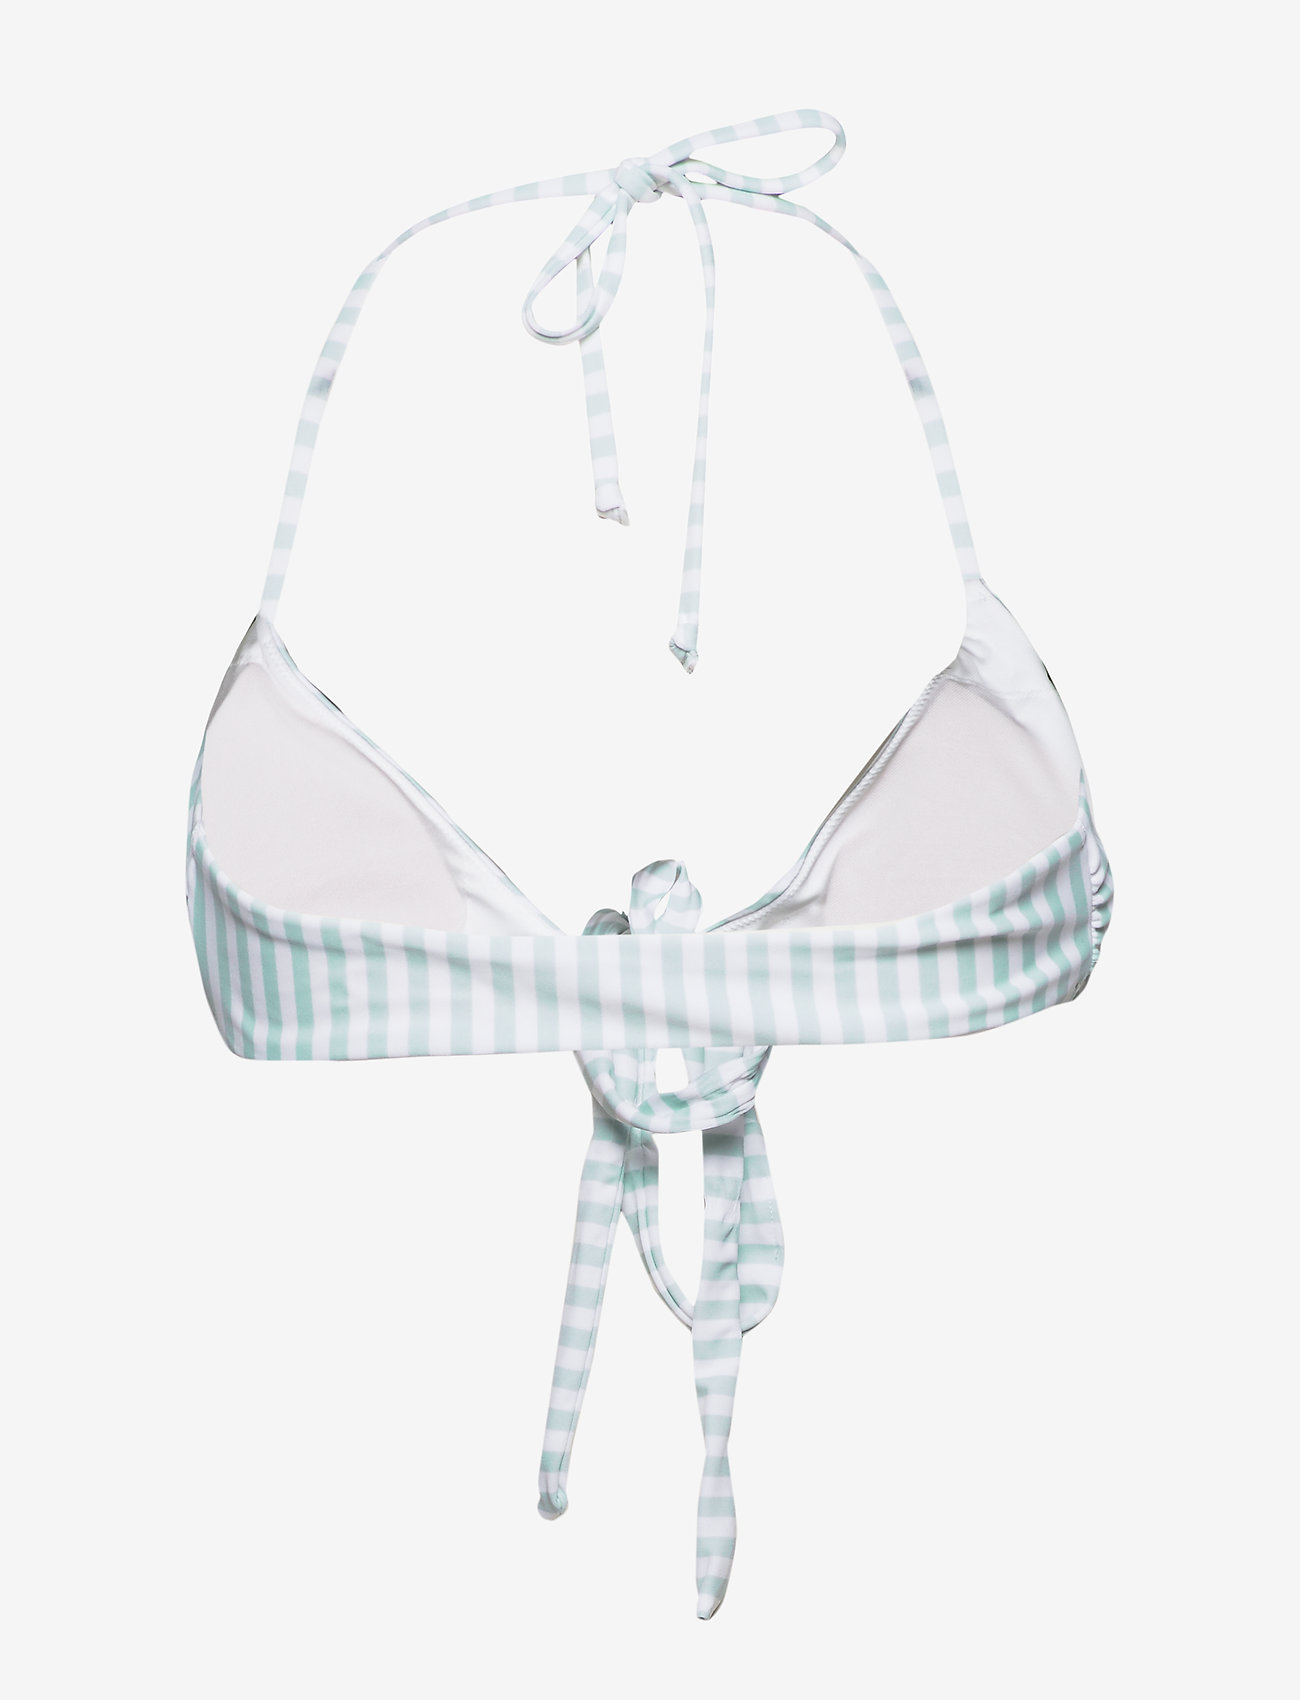 Wrap Triangle Arona (Light Blue Stripe) - Hollister AcxjOe